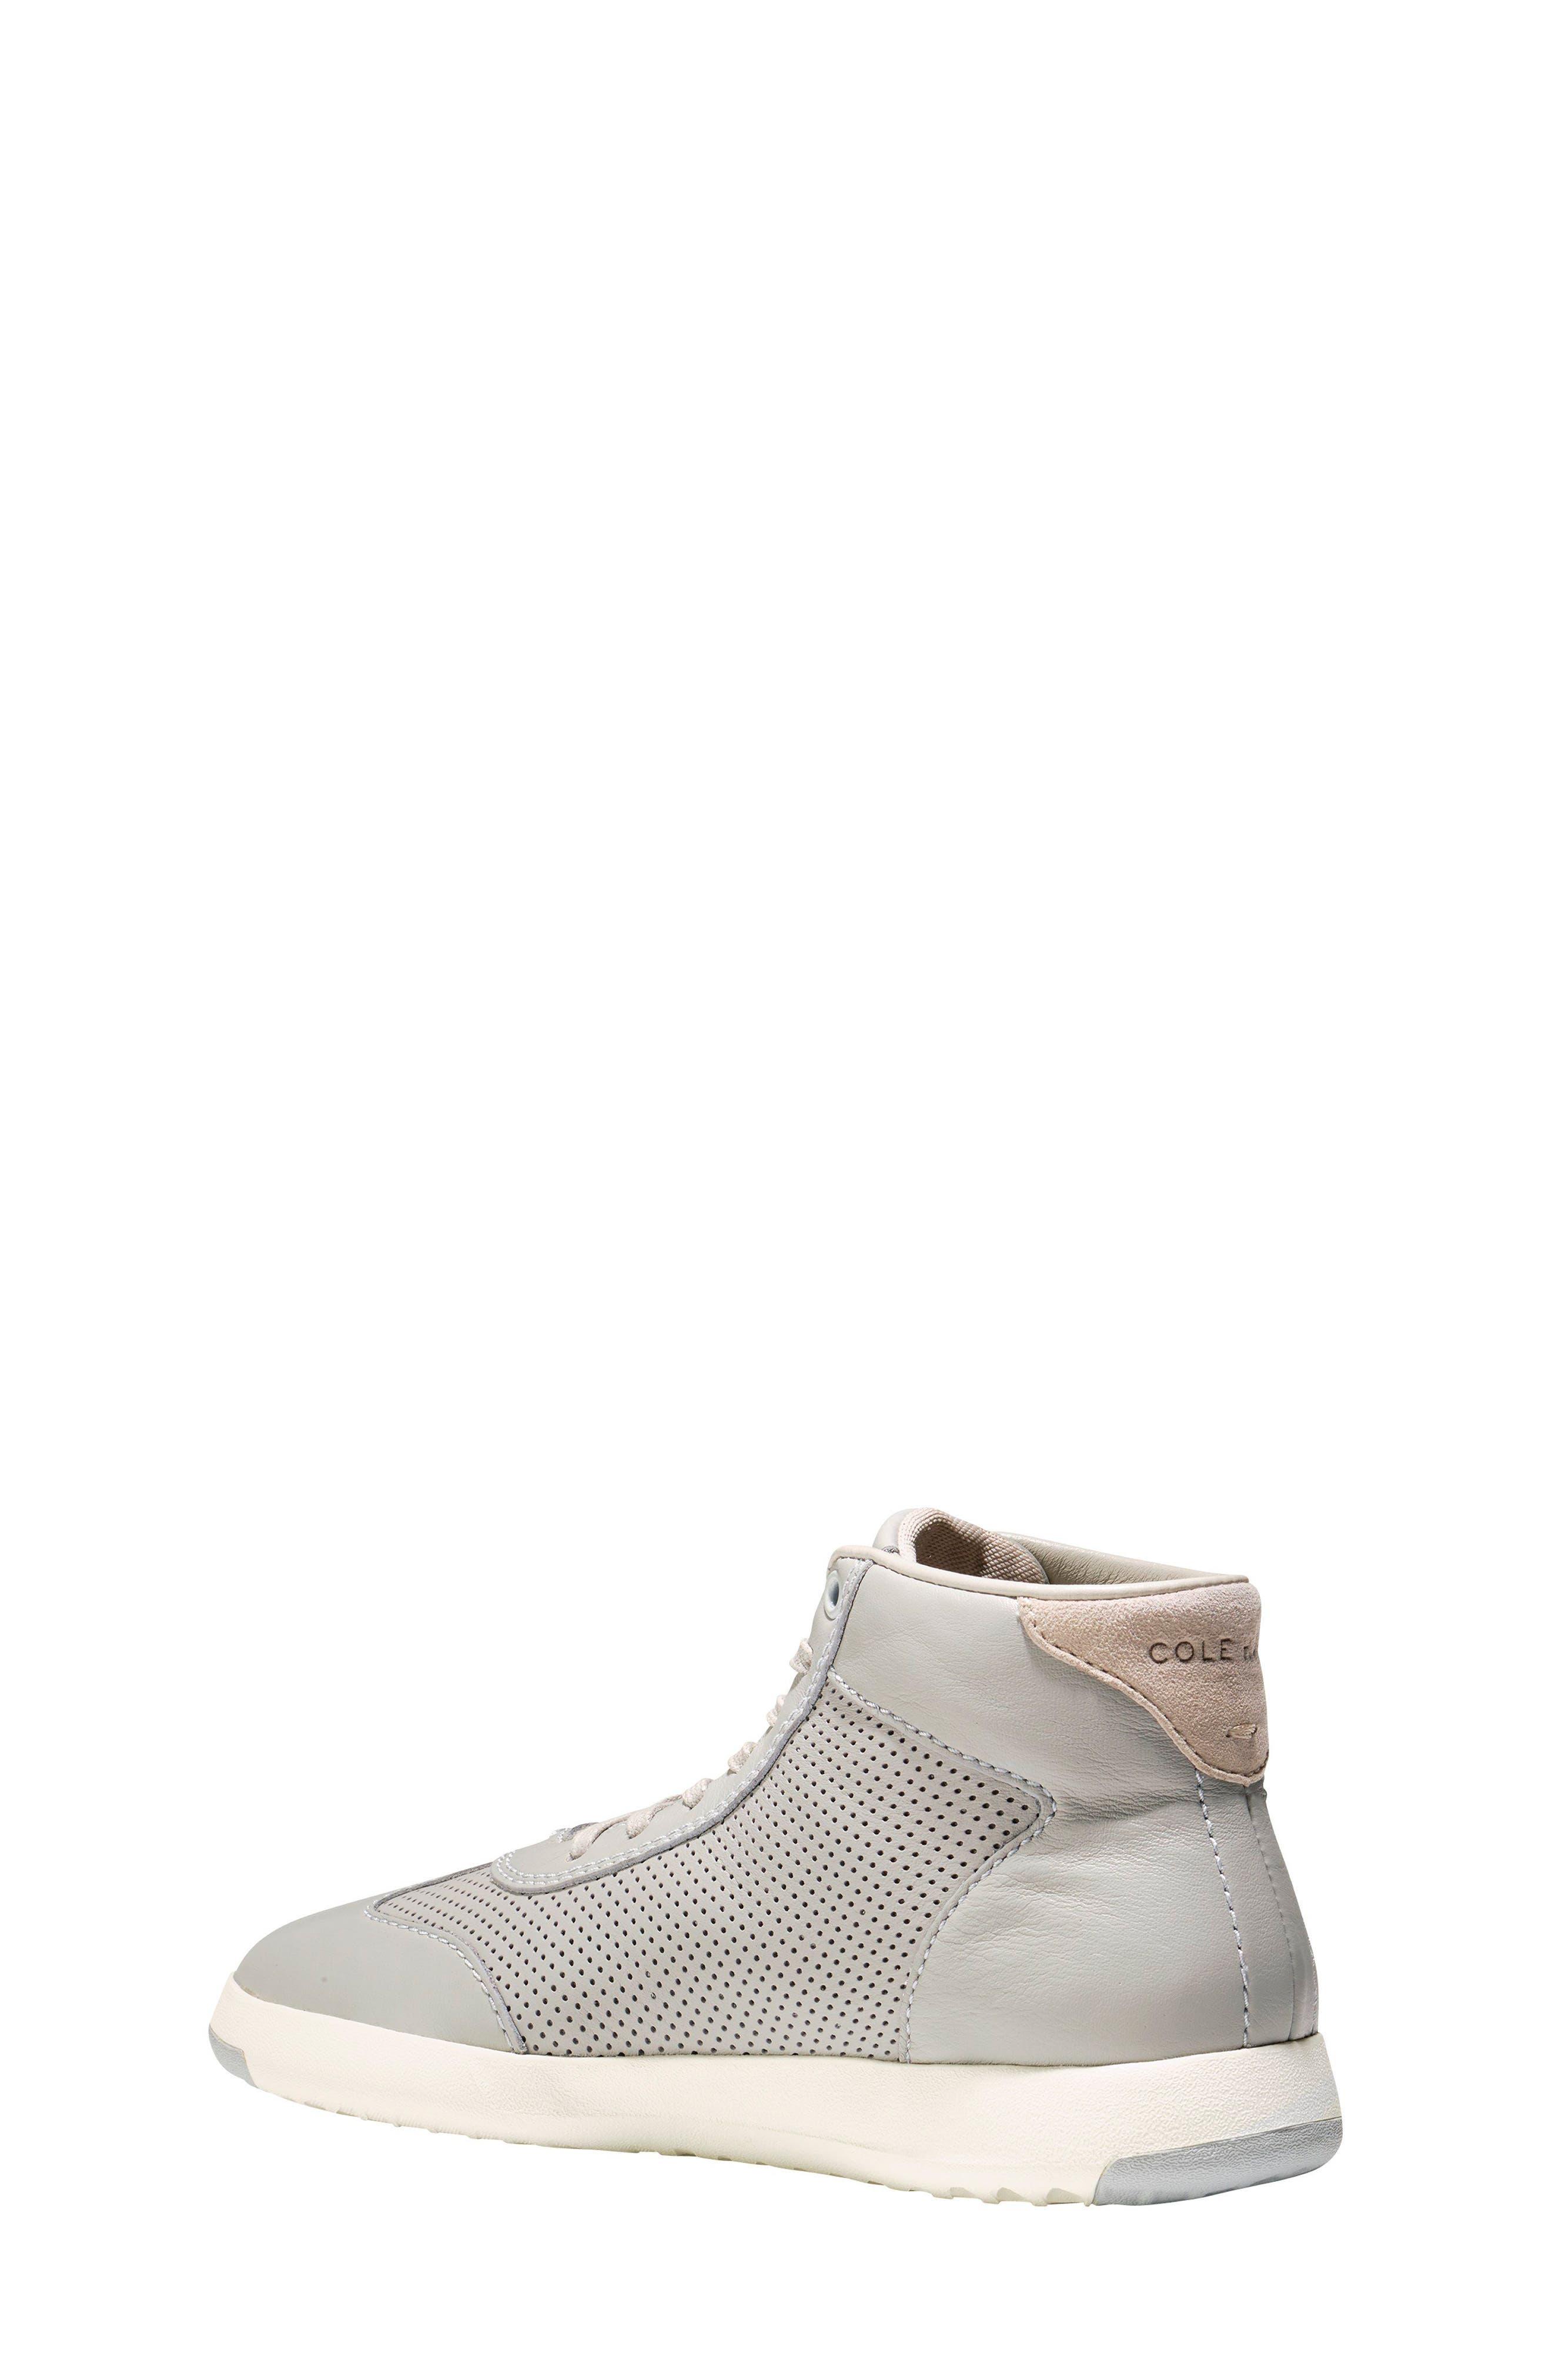 GrandPro High Top Sneaker,                             Alternate thumbnail 5, color,